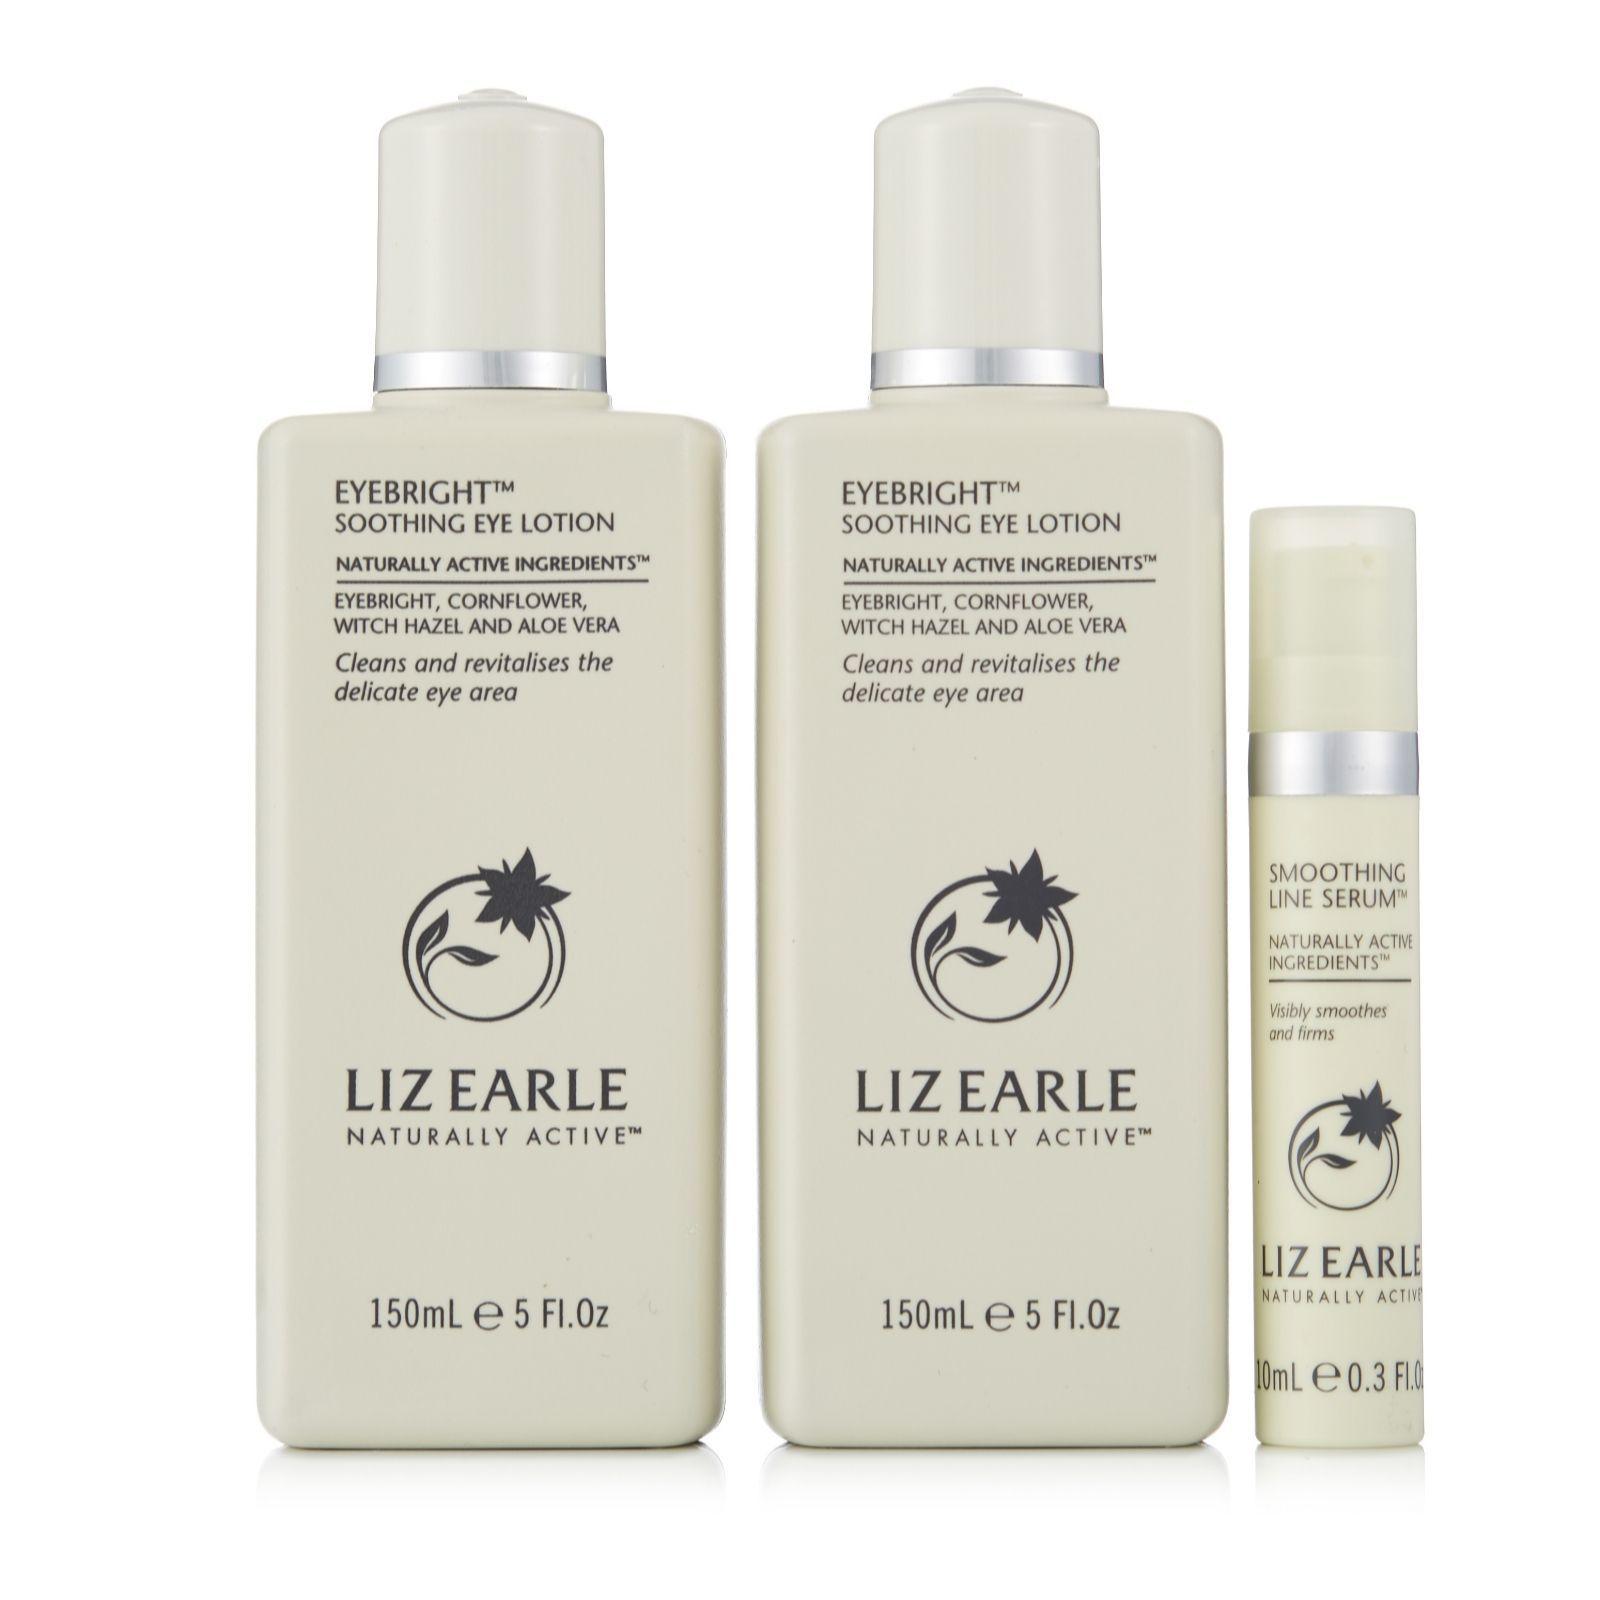 214066 Liz Earle Eyebright Duo & Smoothing Line Serum